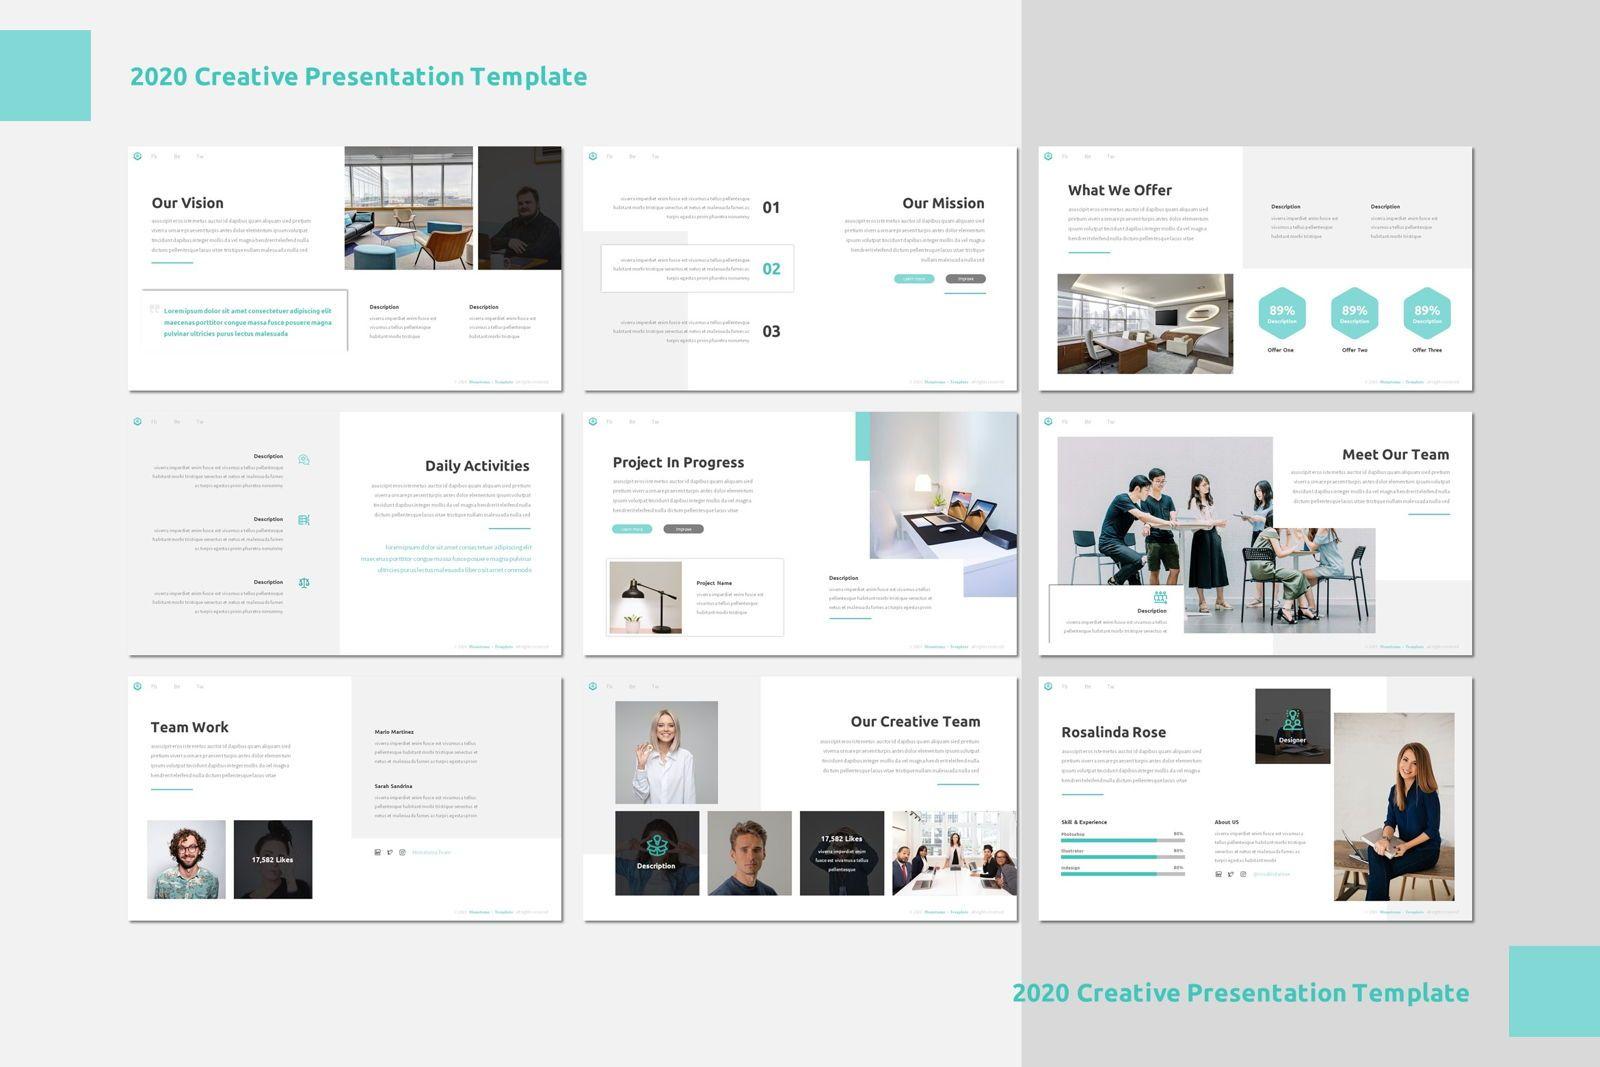 Monatoma - Powerpoint Template, Slide 3, 07779, Presentation Templates — PoweredTemplate.com